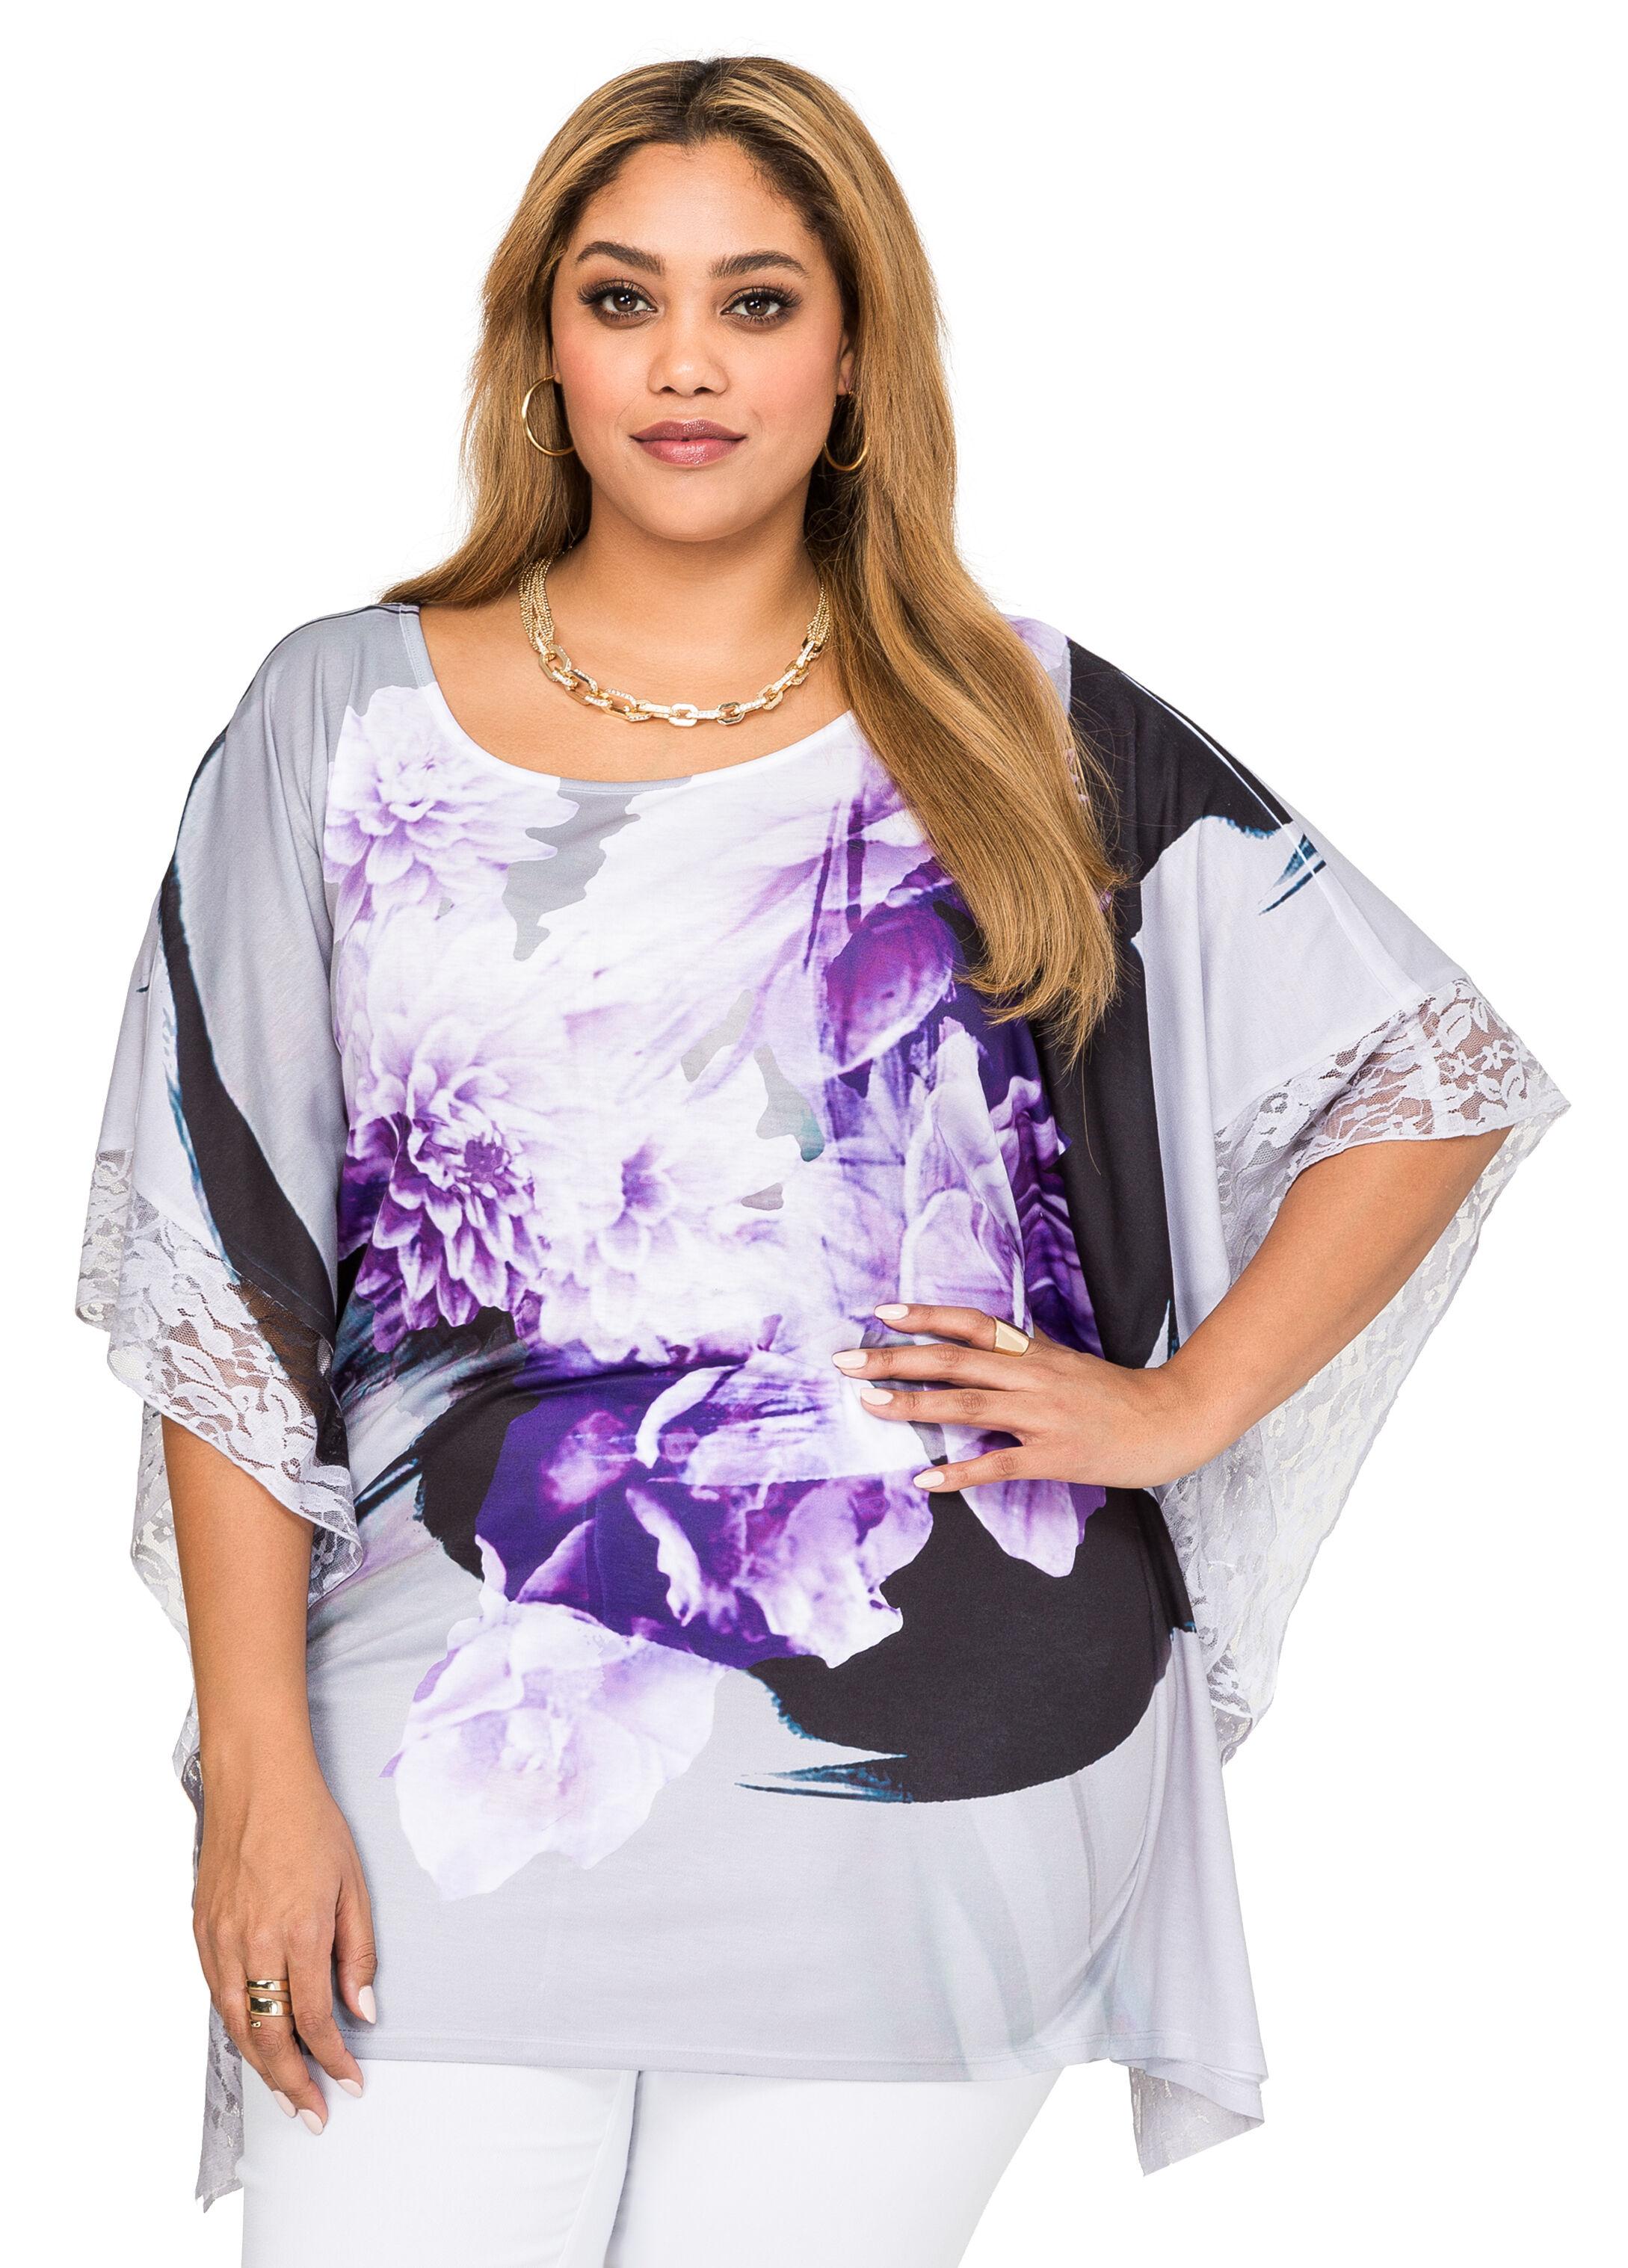 Watercolor Floral Poncho Top